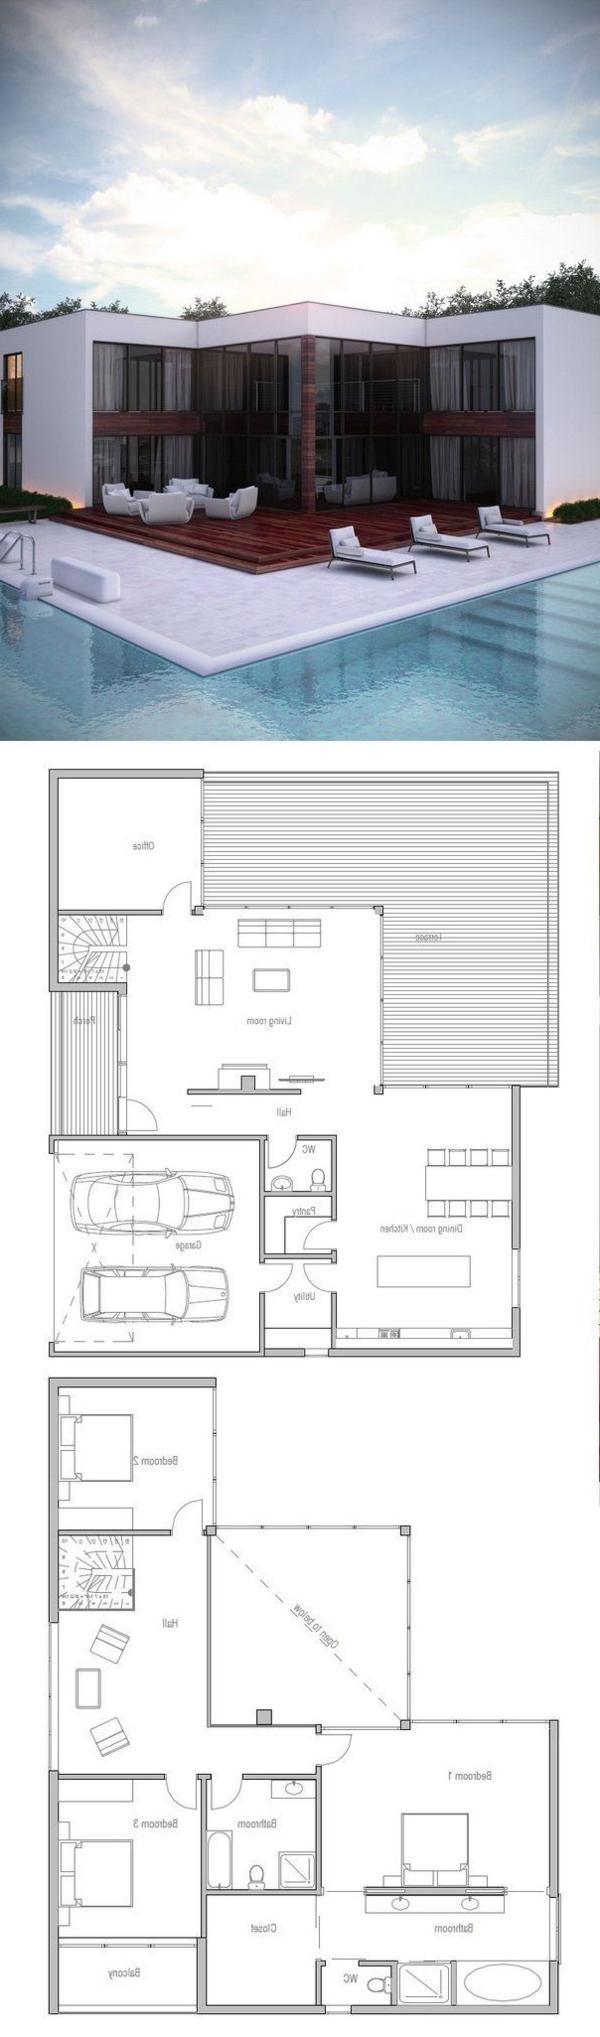 maison-moderne-style-américain-plan-réalisation